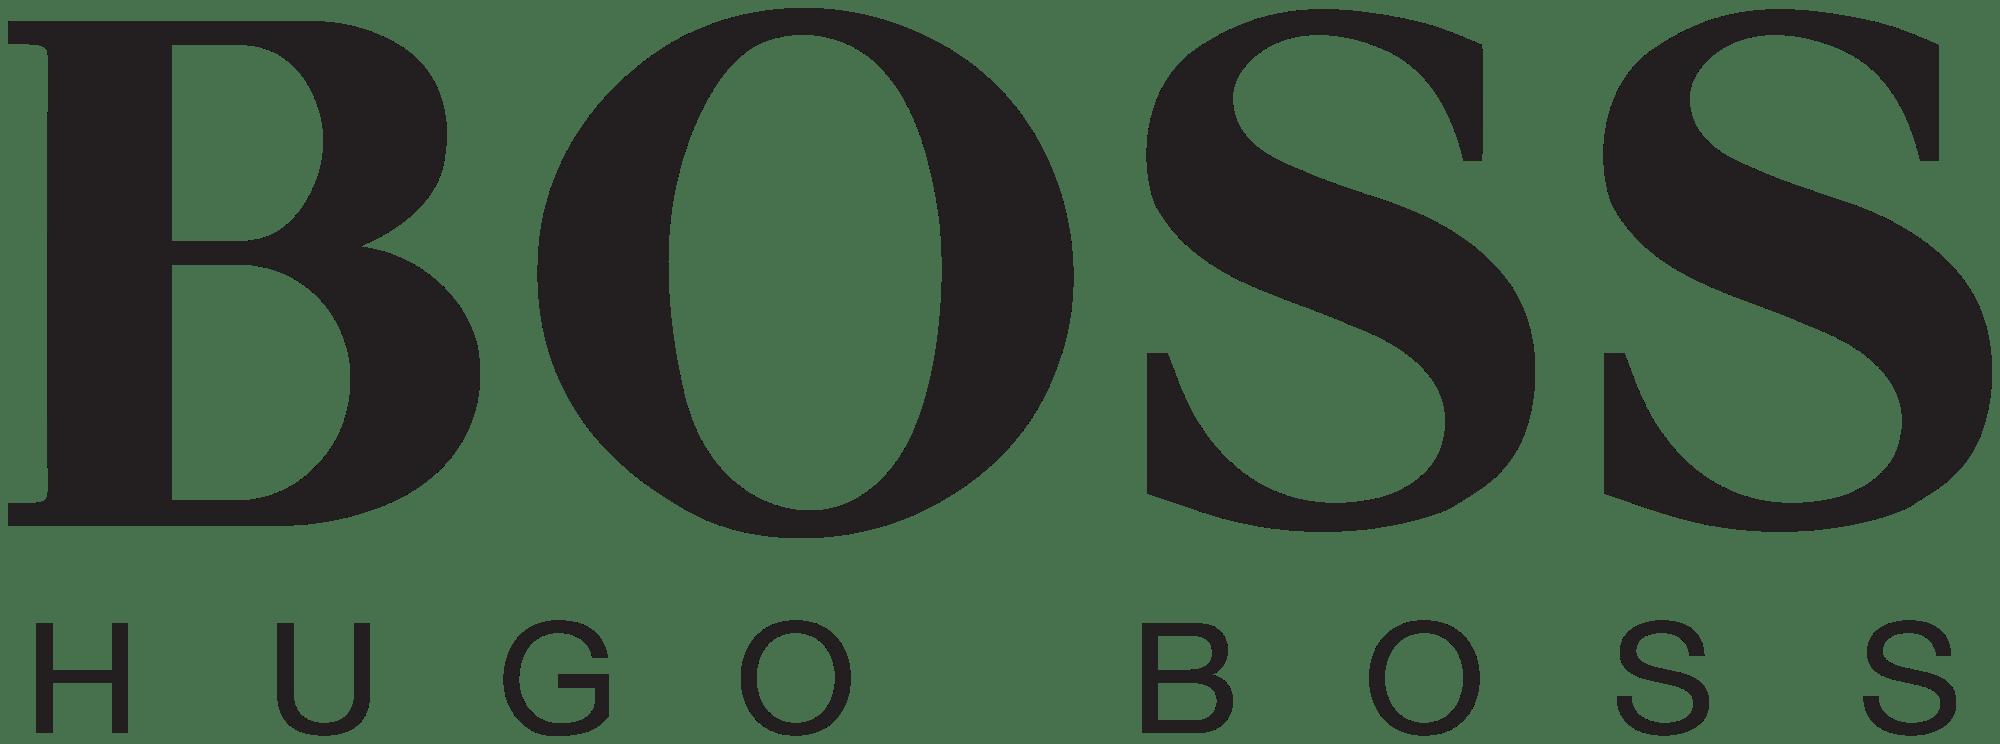 hugo boss logo transparent png stickpng